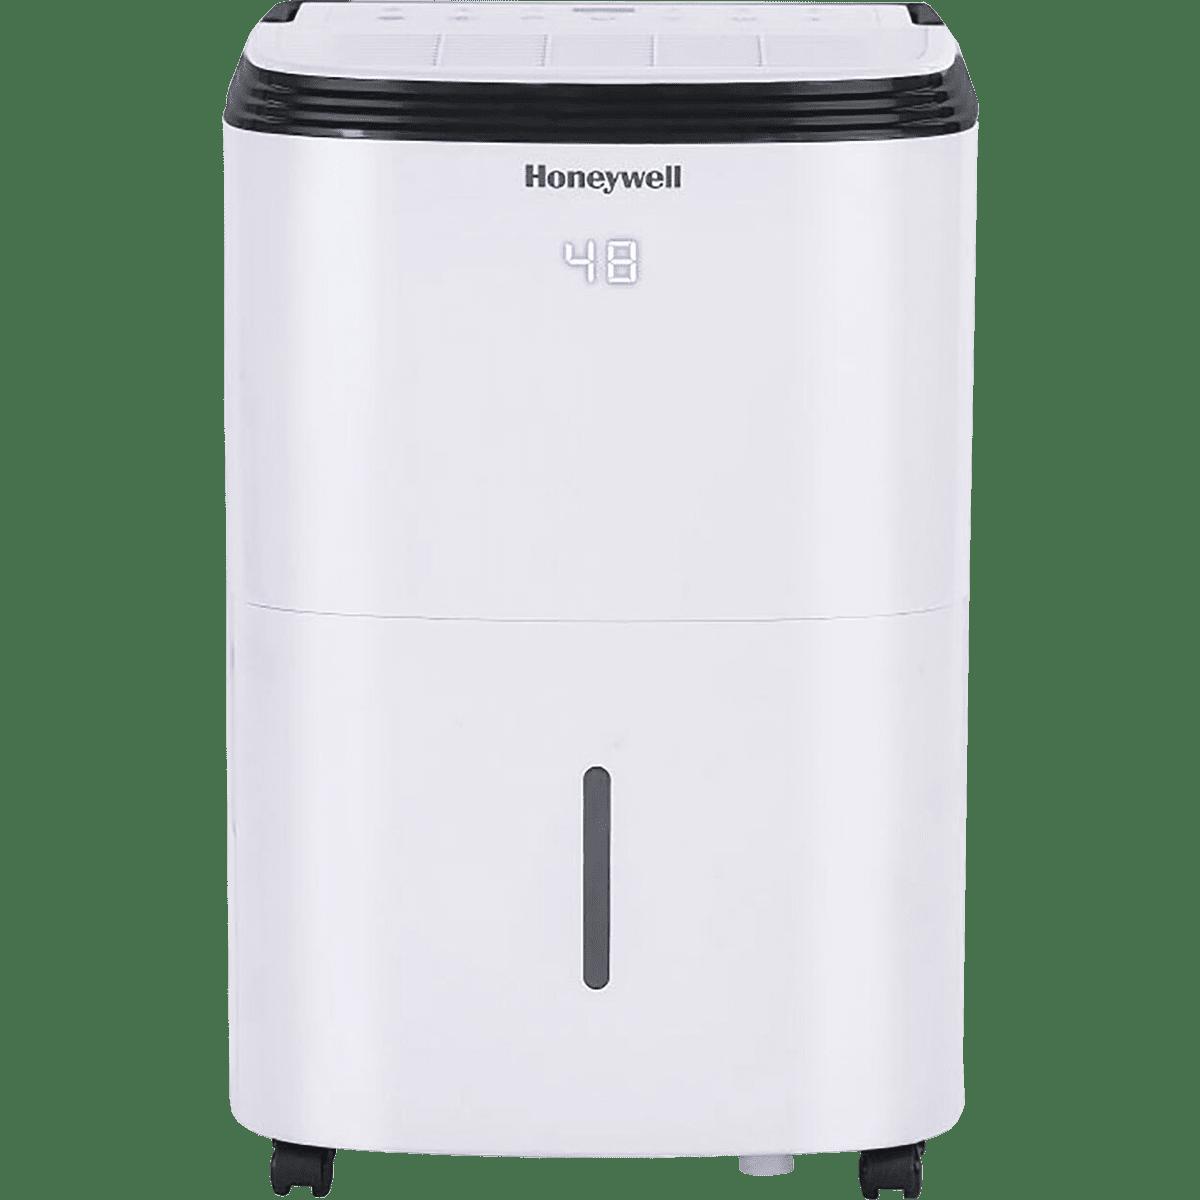 Honeywell TP70PWKN Dehumidifier review